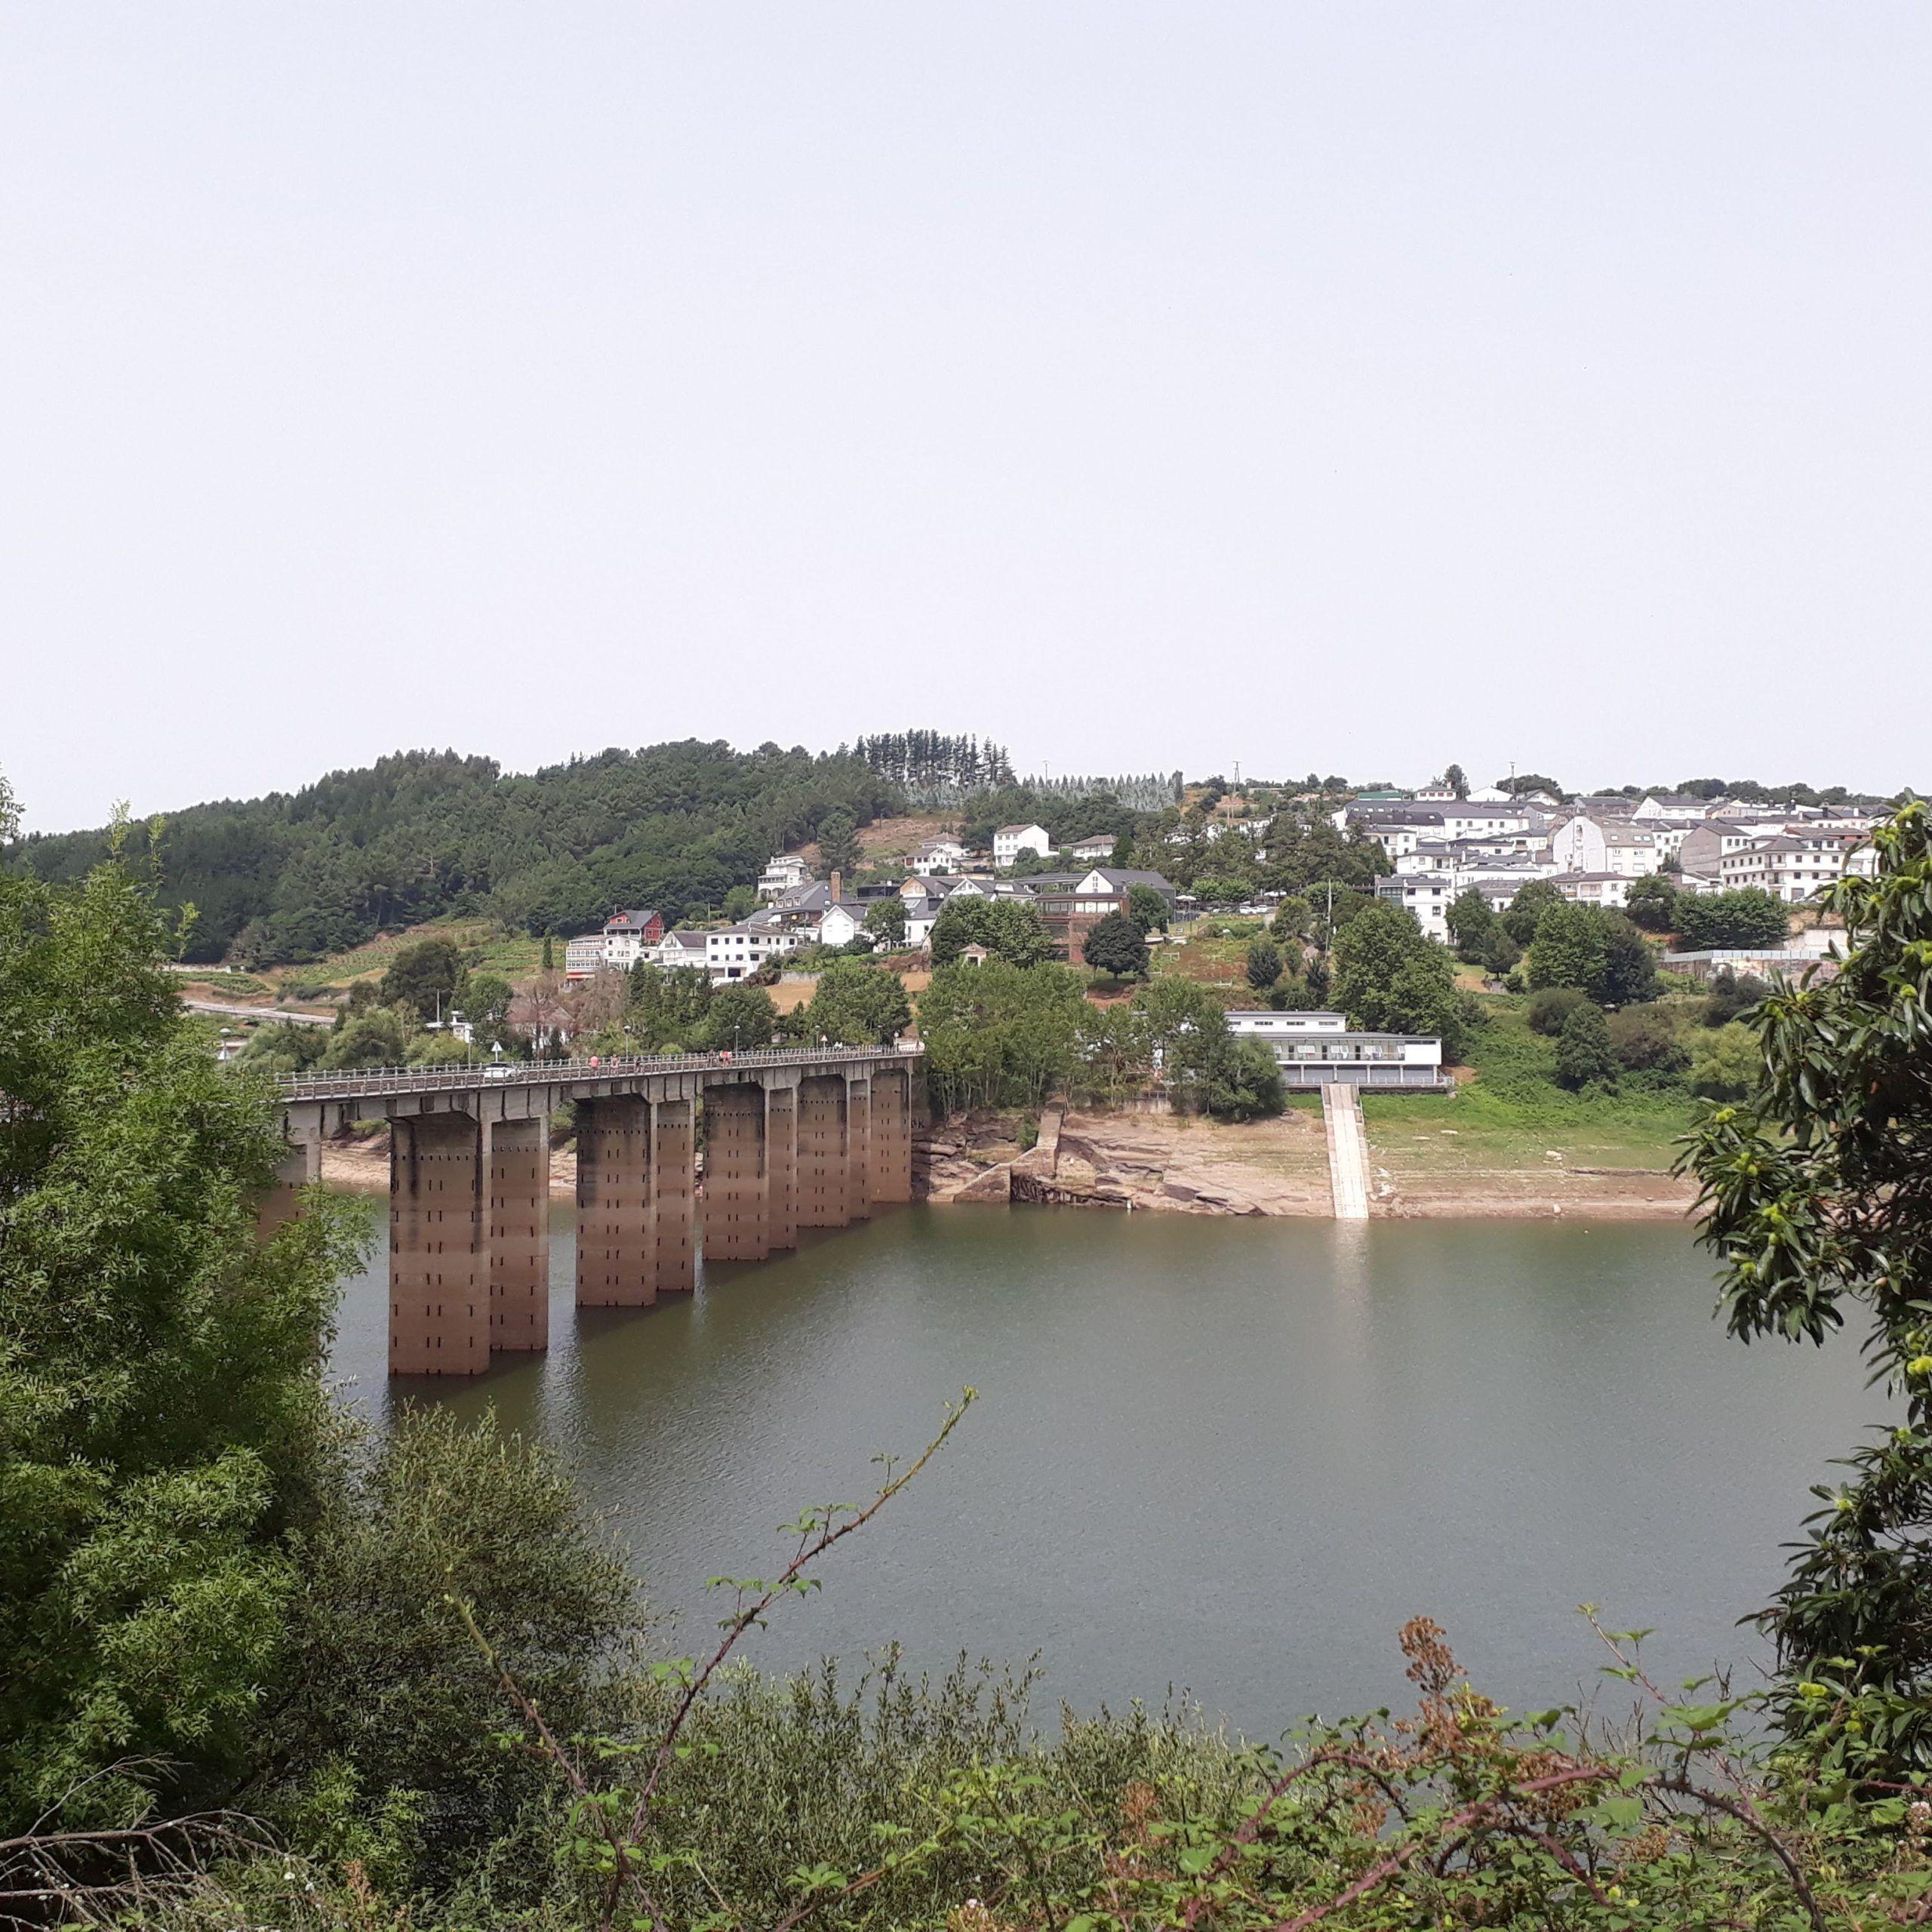 Day 2 Sarria - Portomarin 22 km